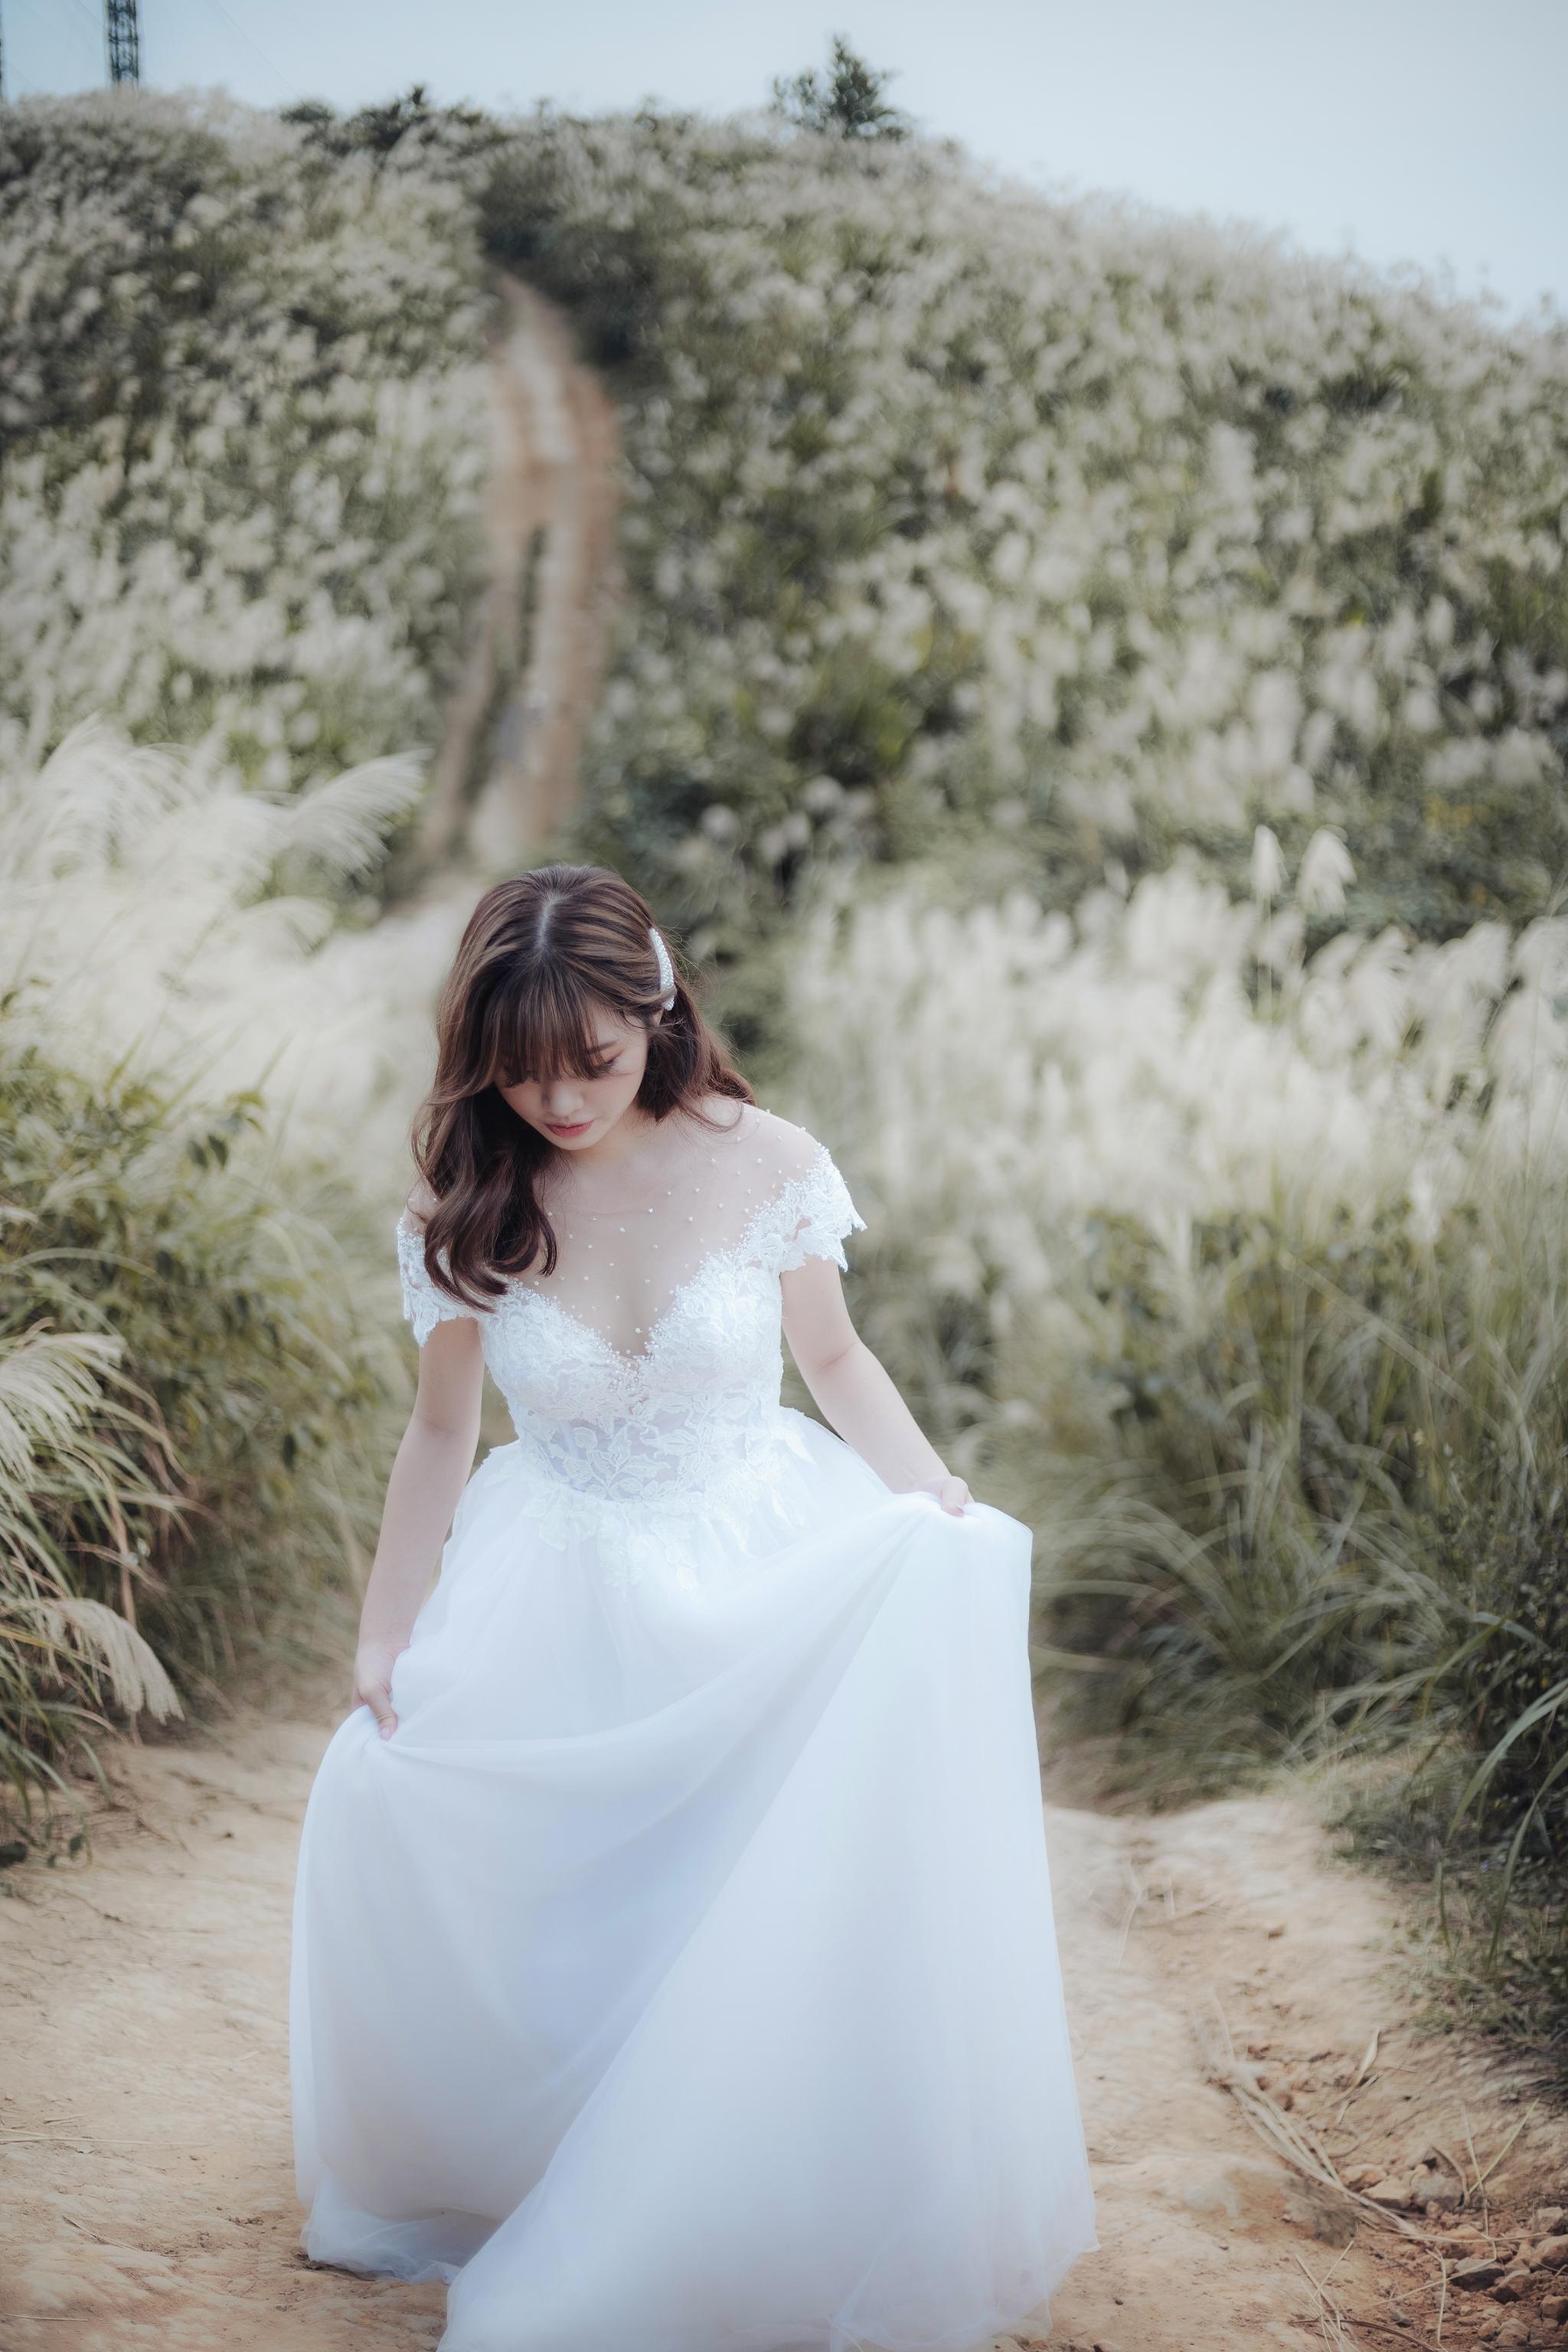 50697325507 4f6ec7f510 o - 【自主婚紗】+凱婷+